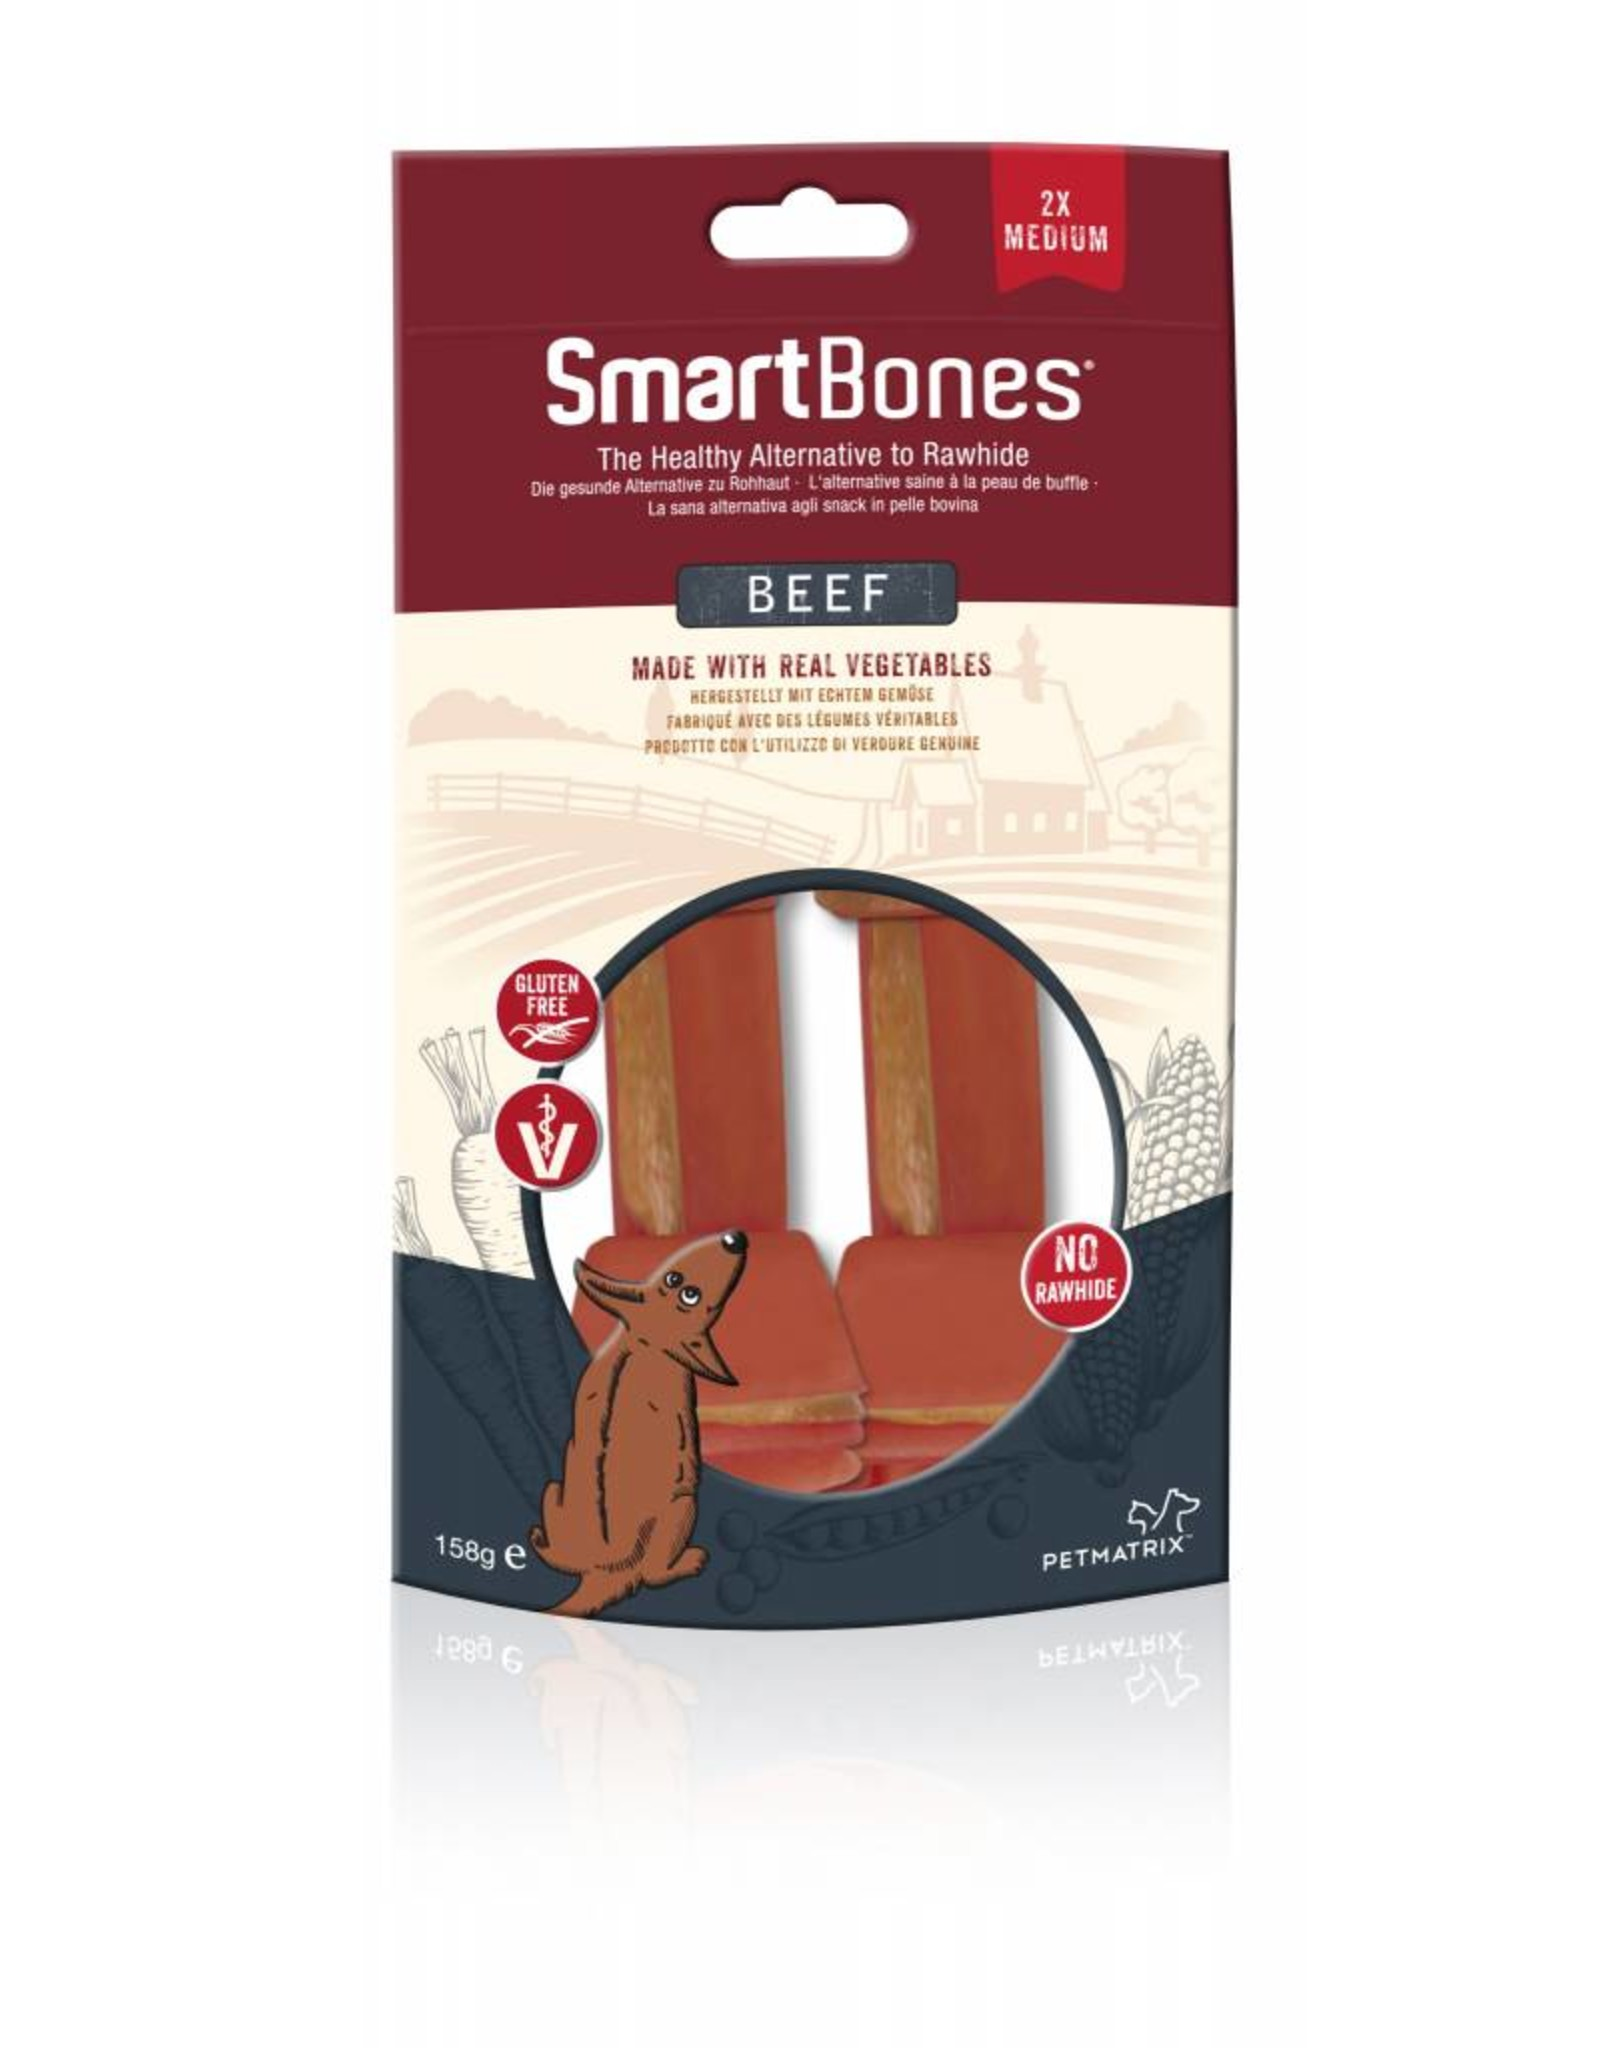 SmartBones Rawhide Alternative Beef Bones Dog Treats, Medium, 2 pack